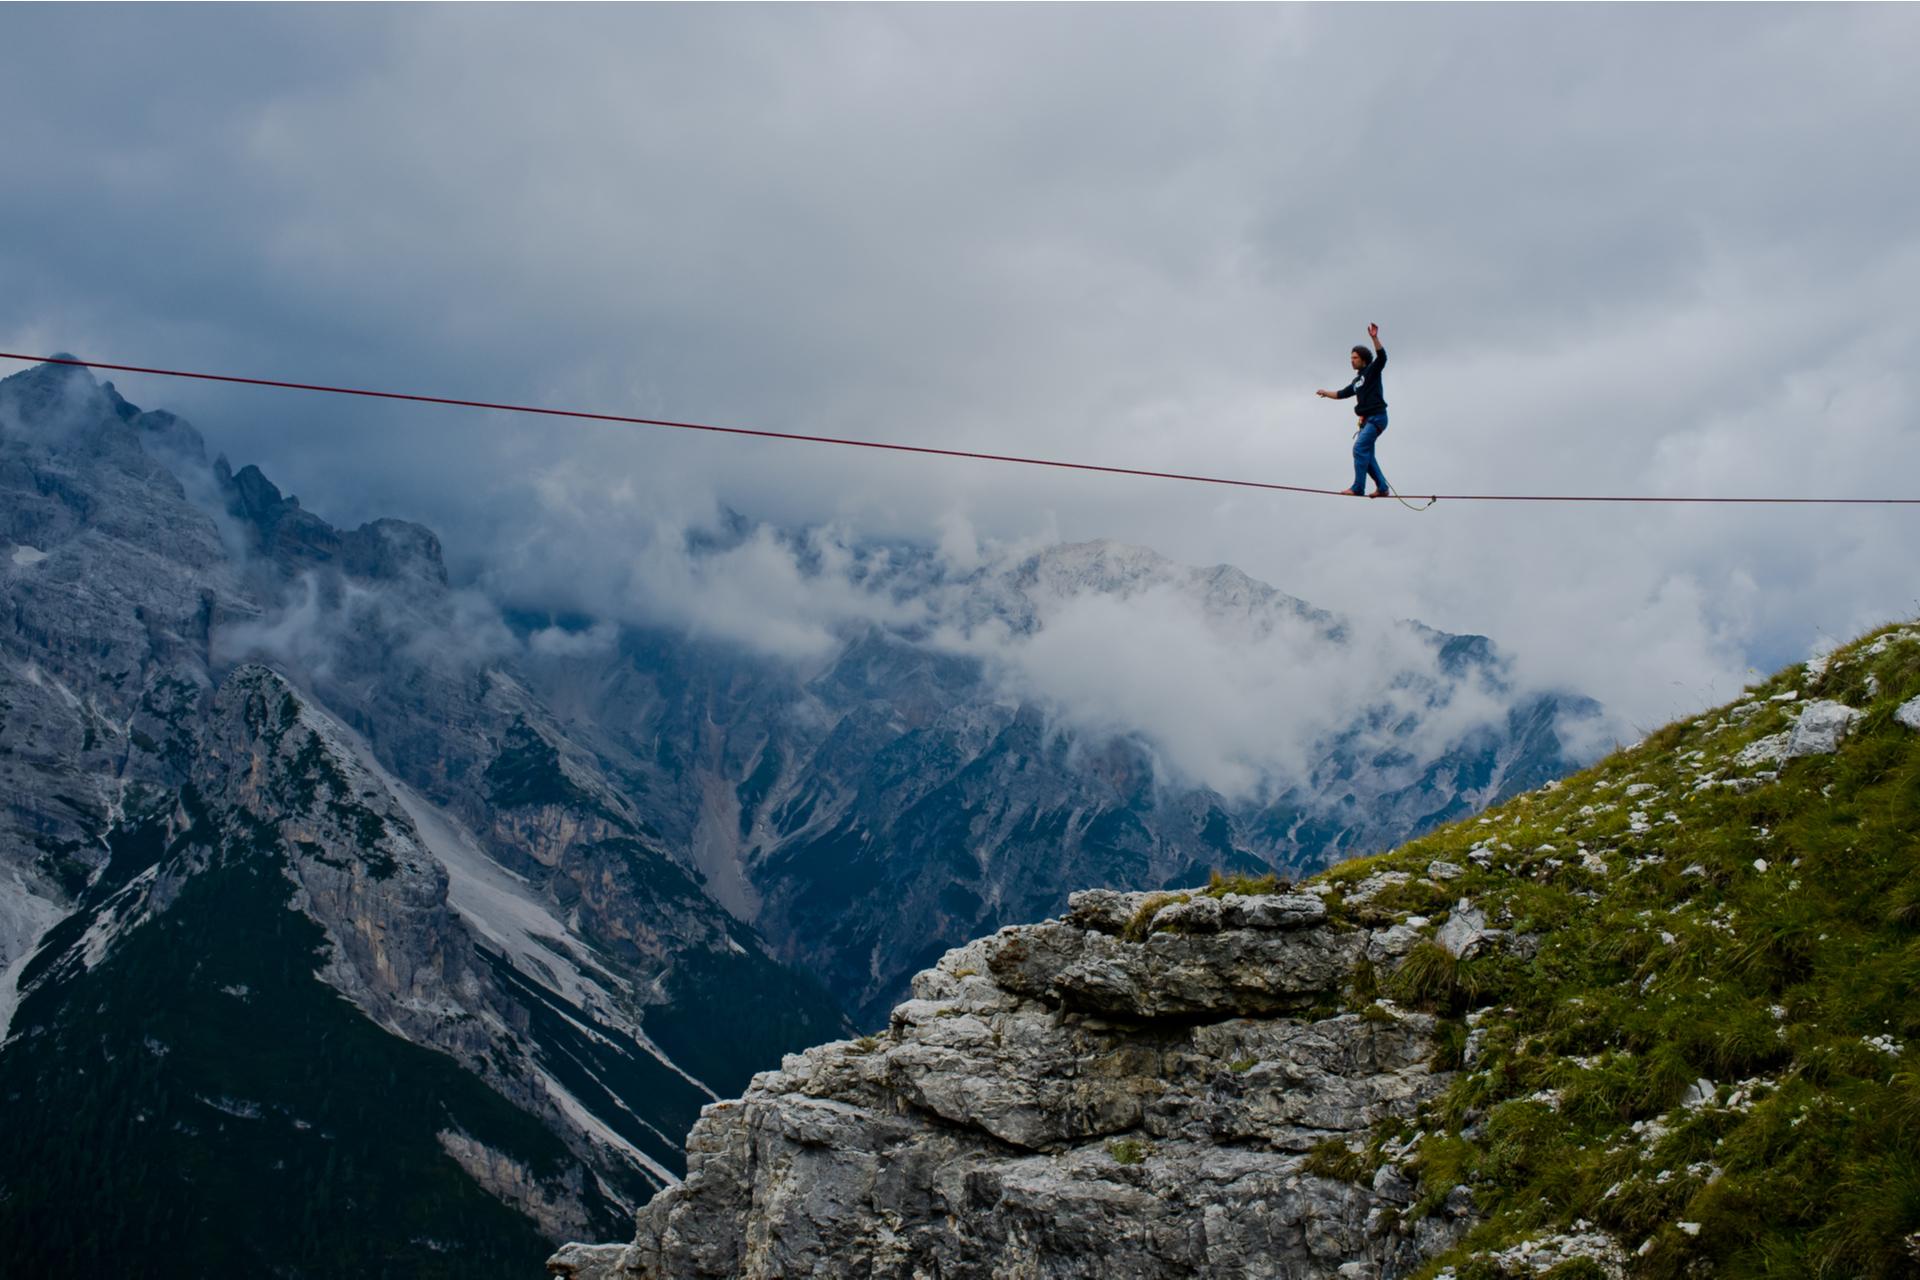 man walks tightrope between mountains